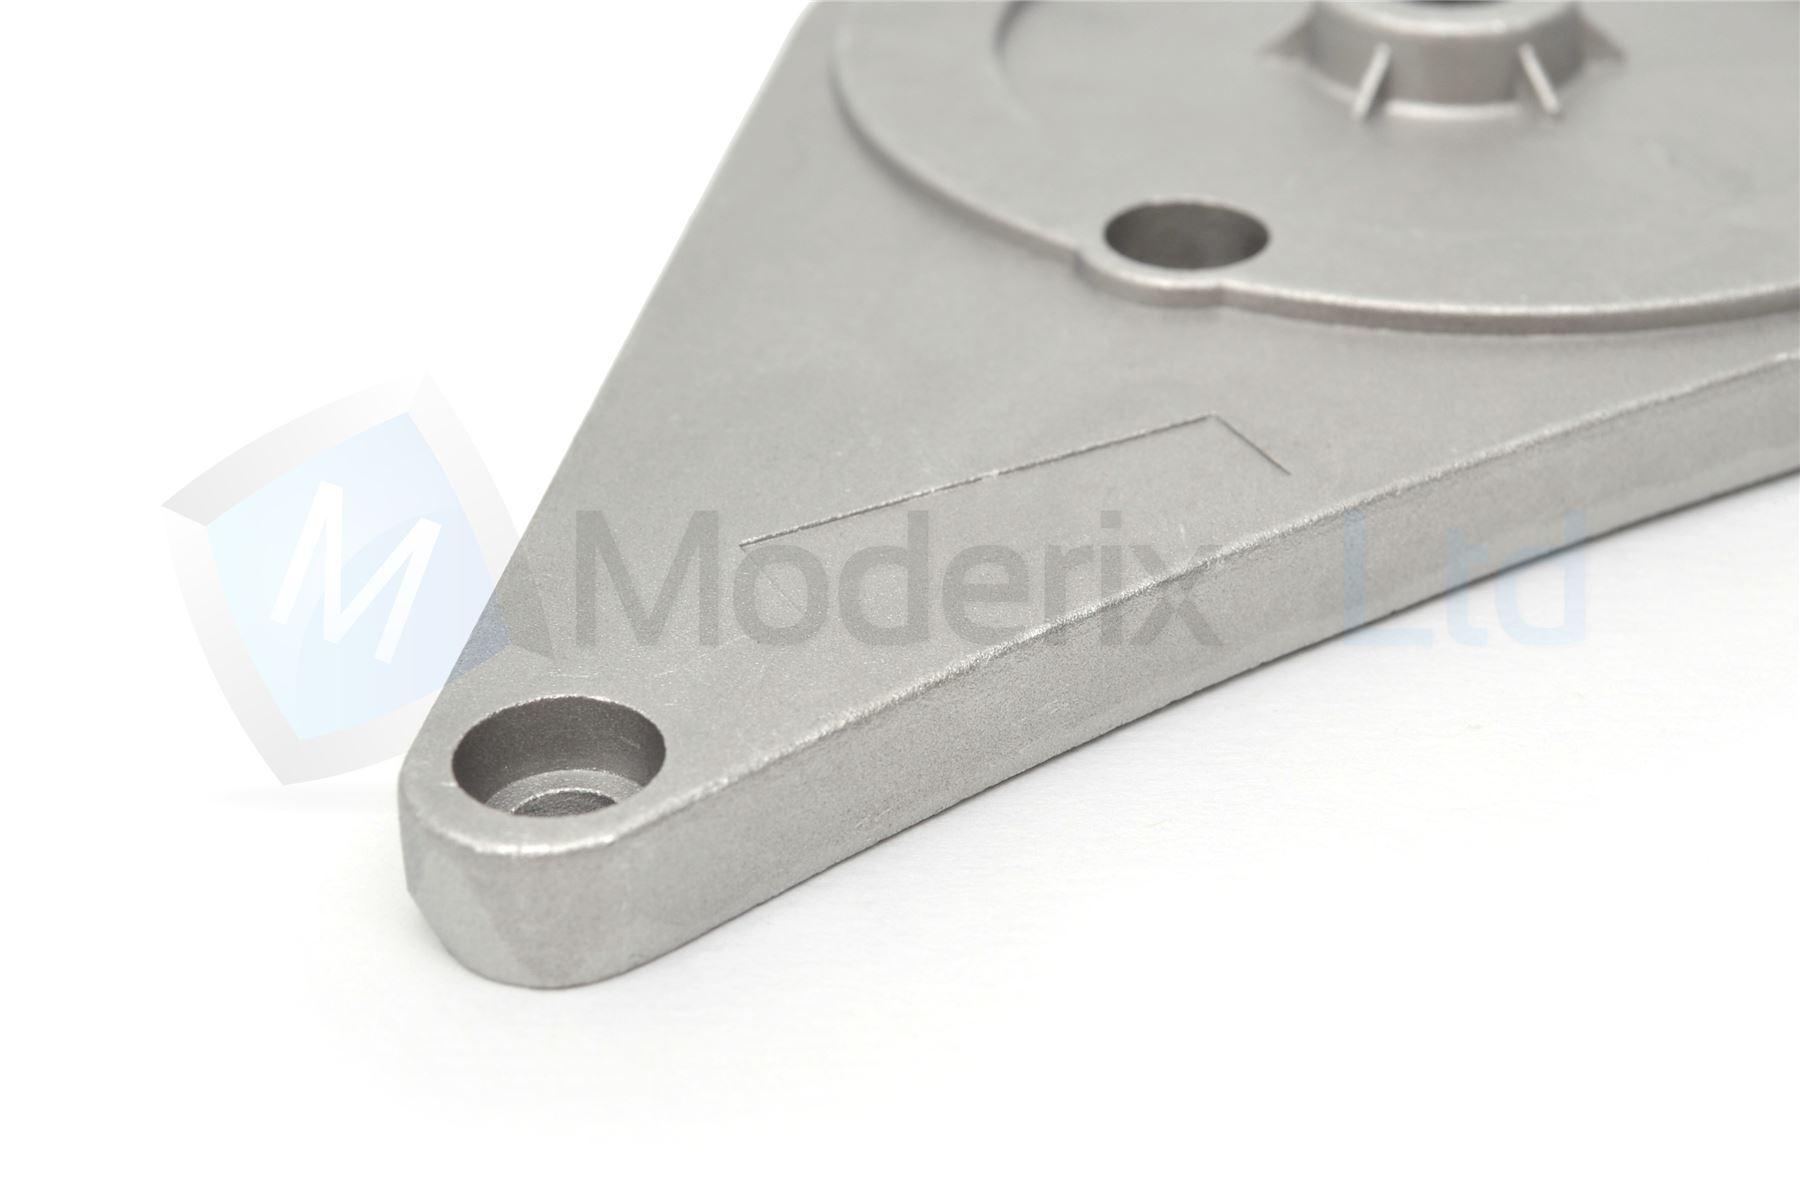 Mounting bracket fitting adapter for worktop breakfast bar